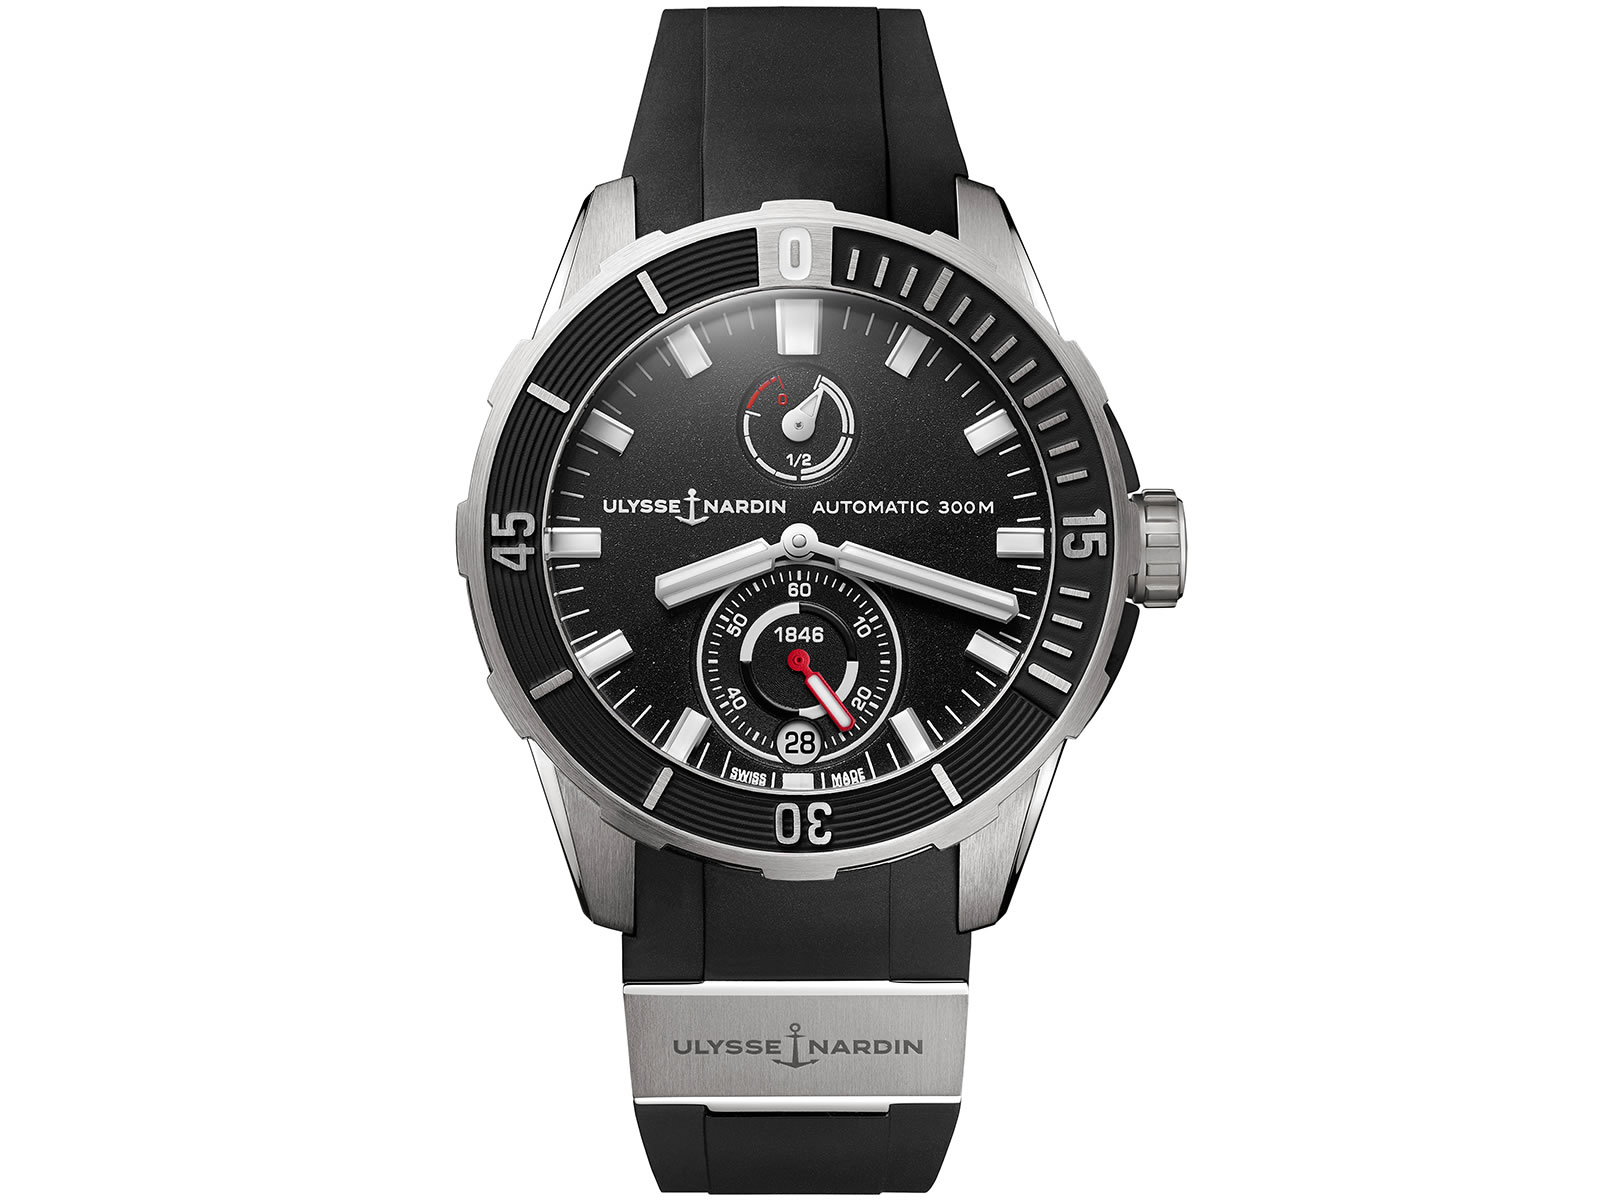 1183-170-3-92-ulysse-nardin-diver-chronometer-2018-models.jpg